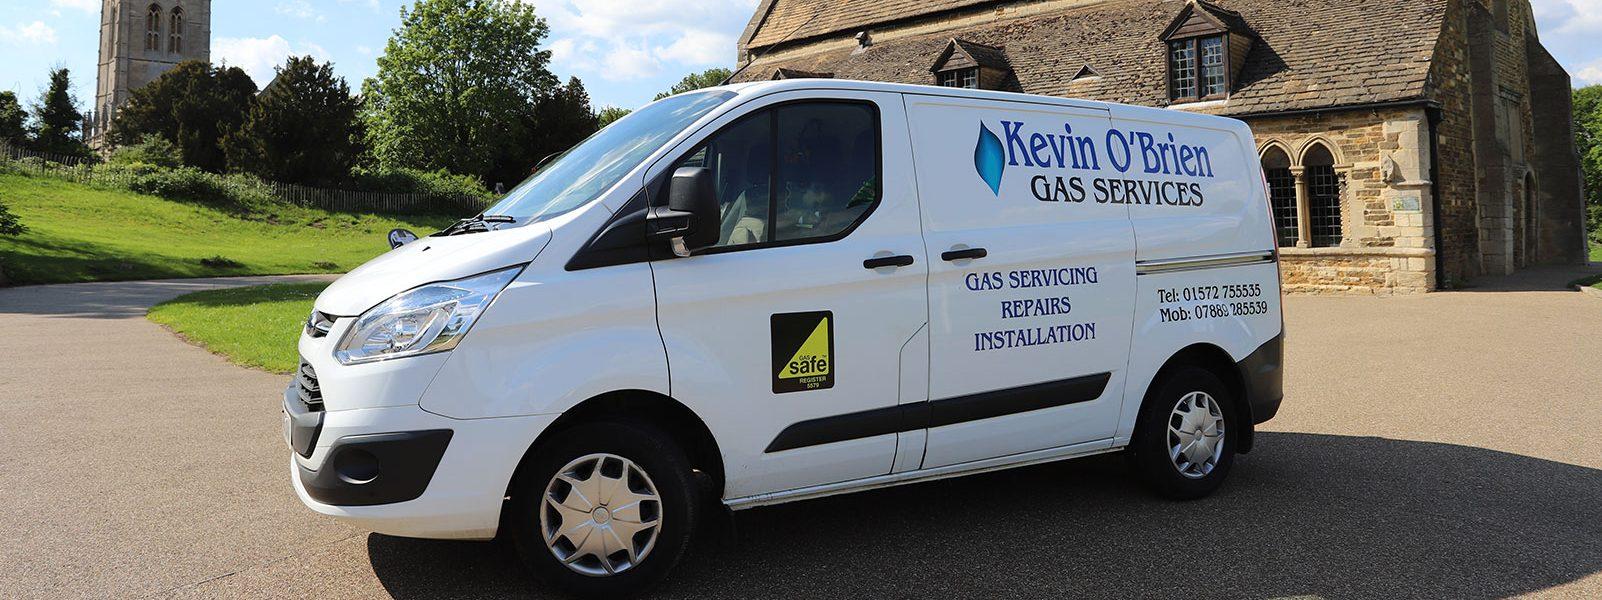 Kevin O'Brien Gas Services